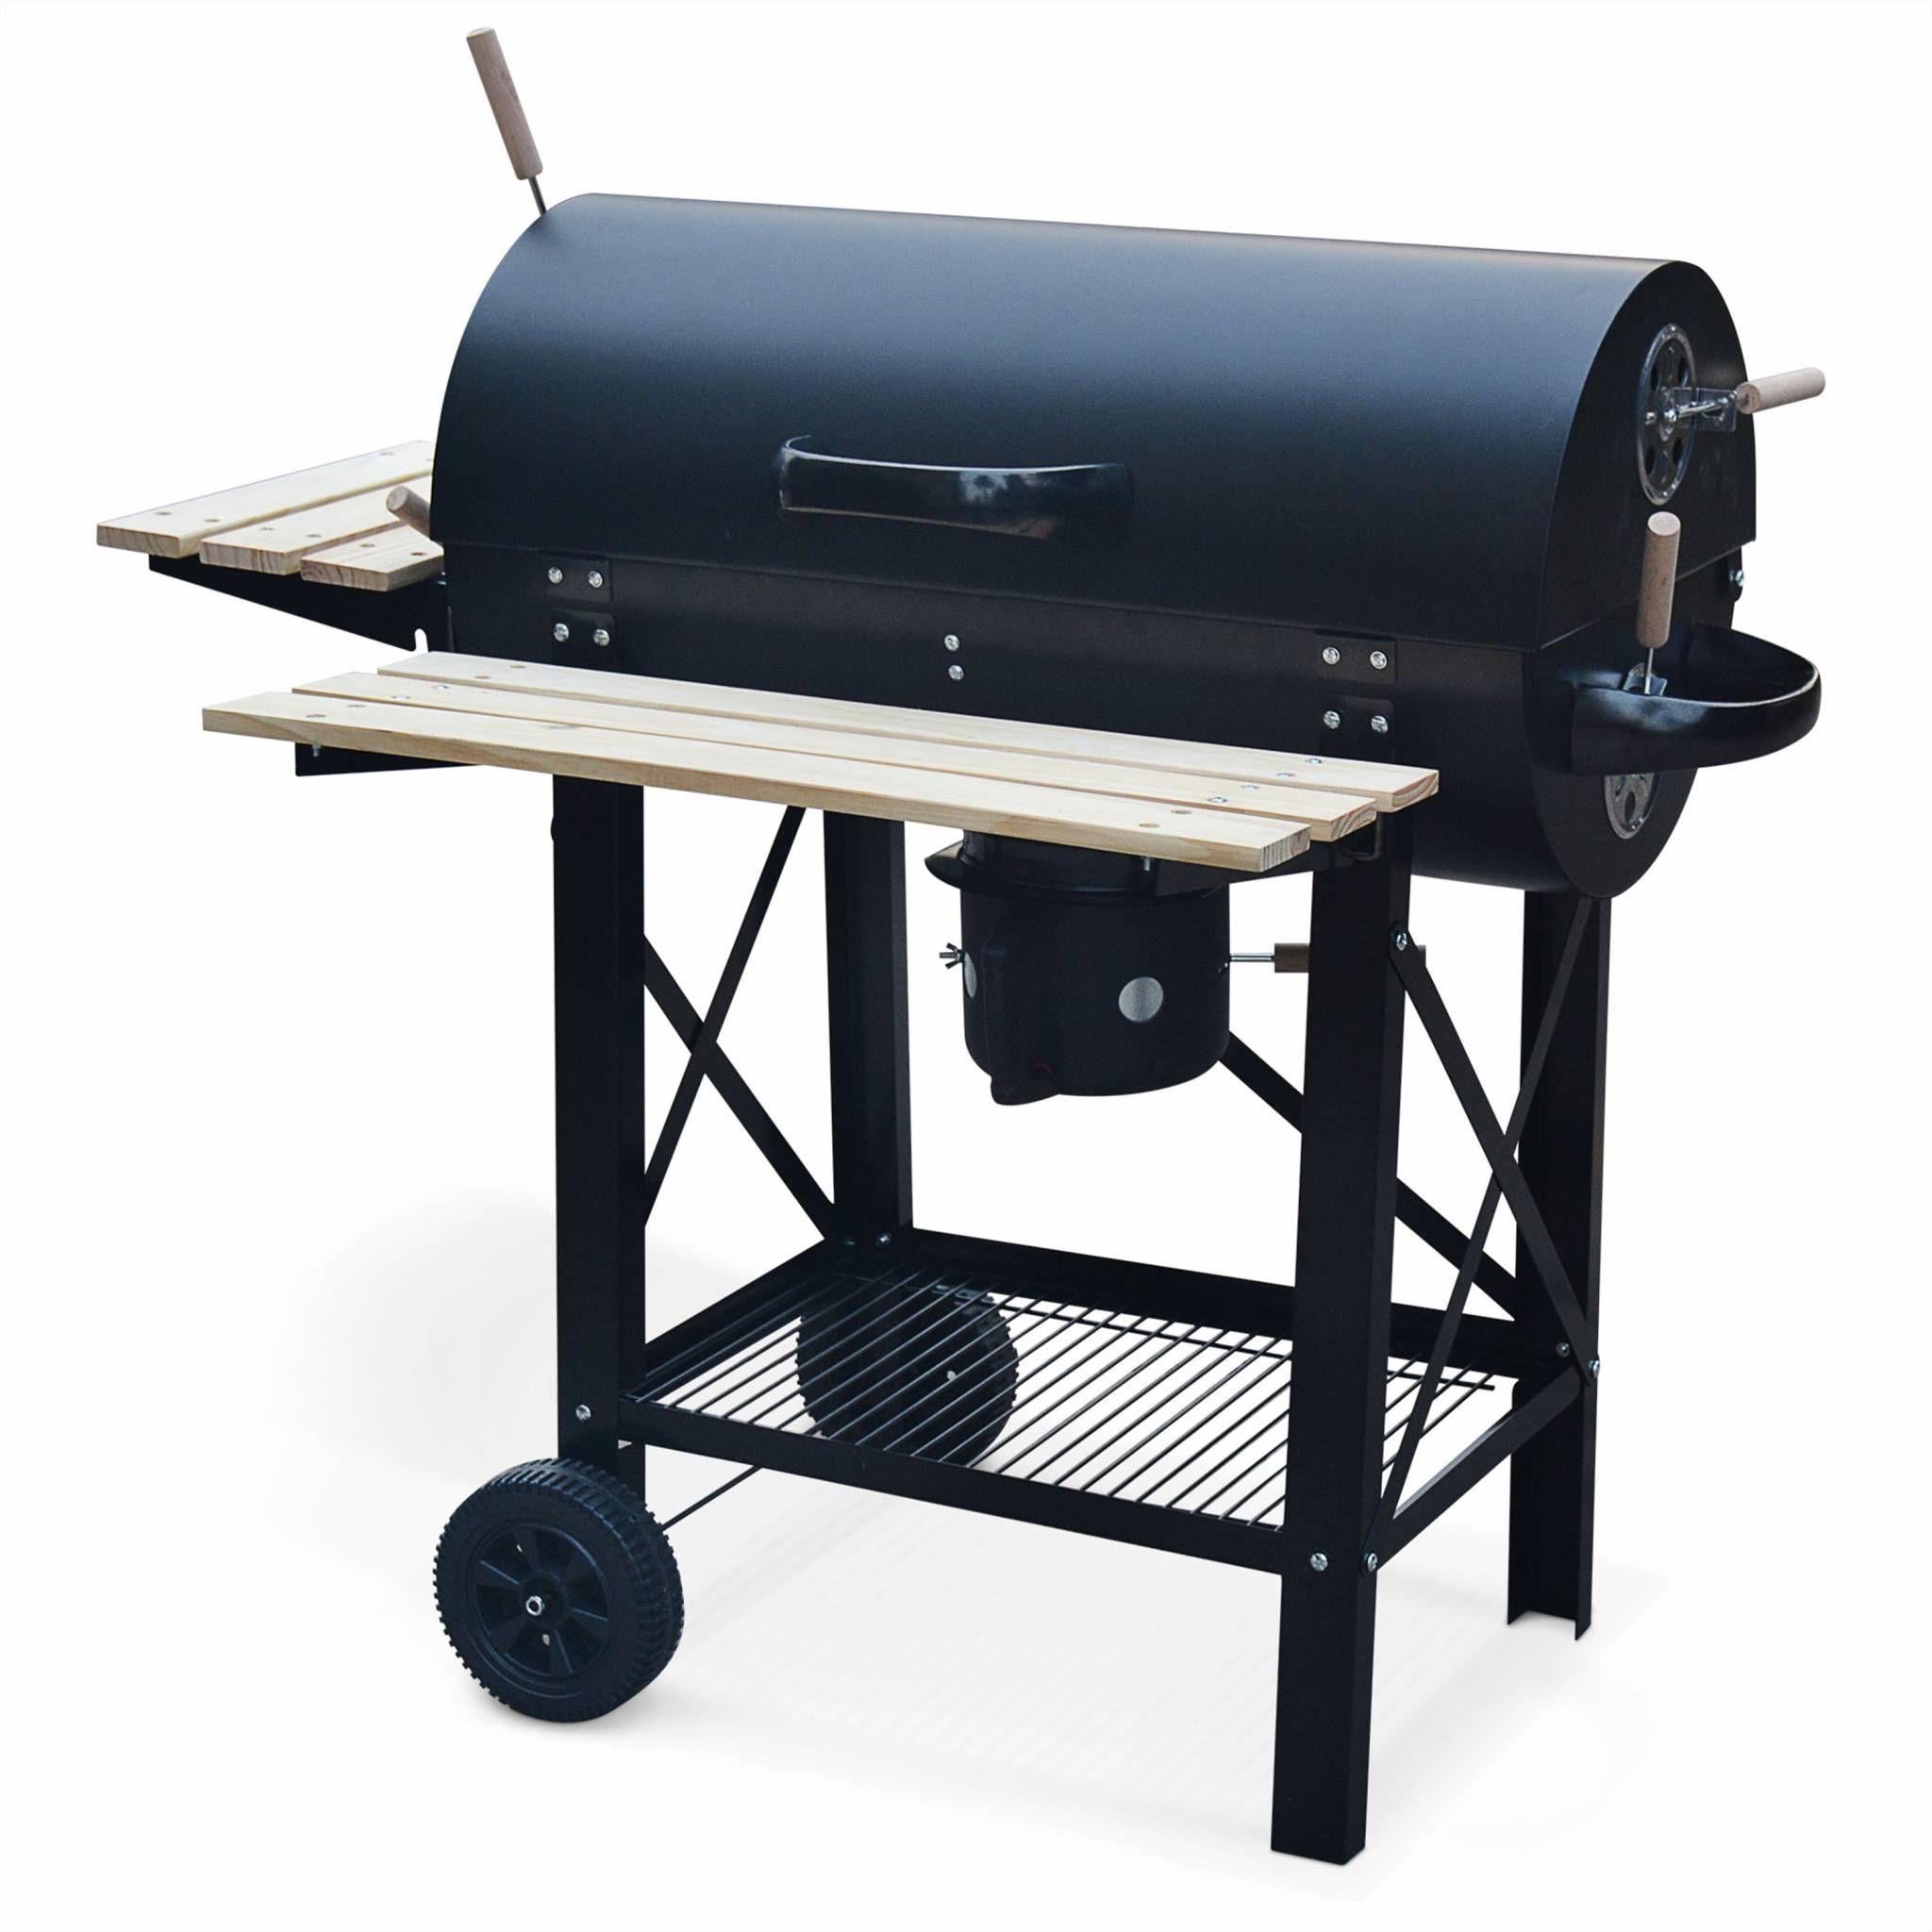 Barbecue américain Smoker fumoir double compartiment grill